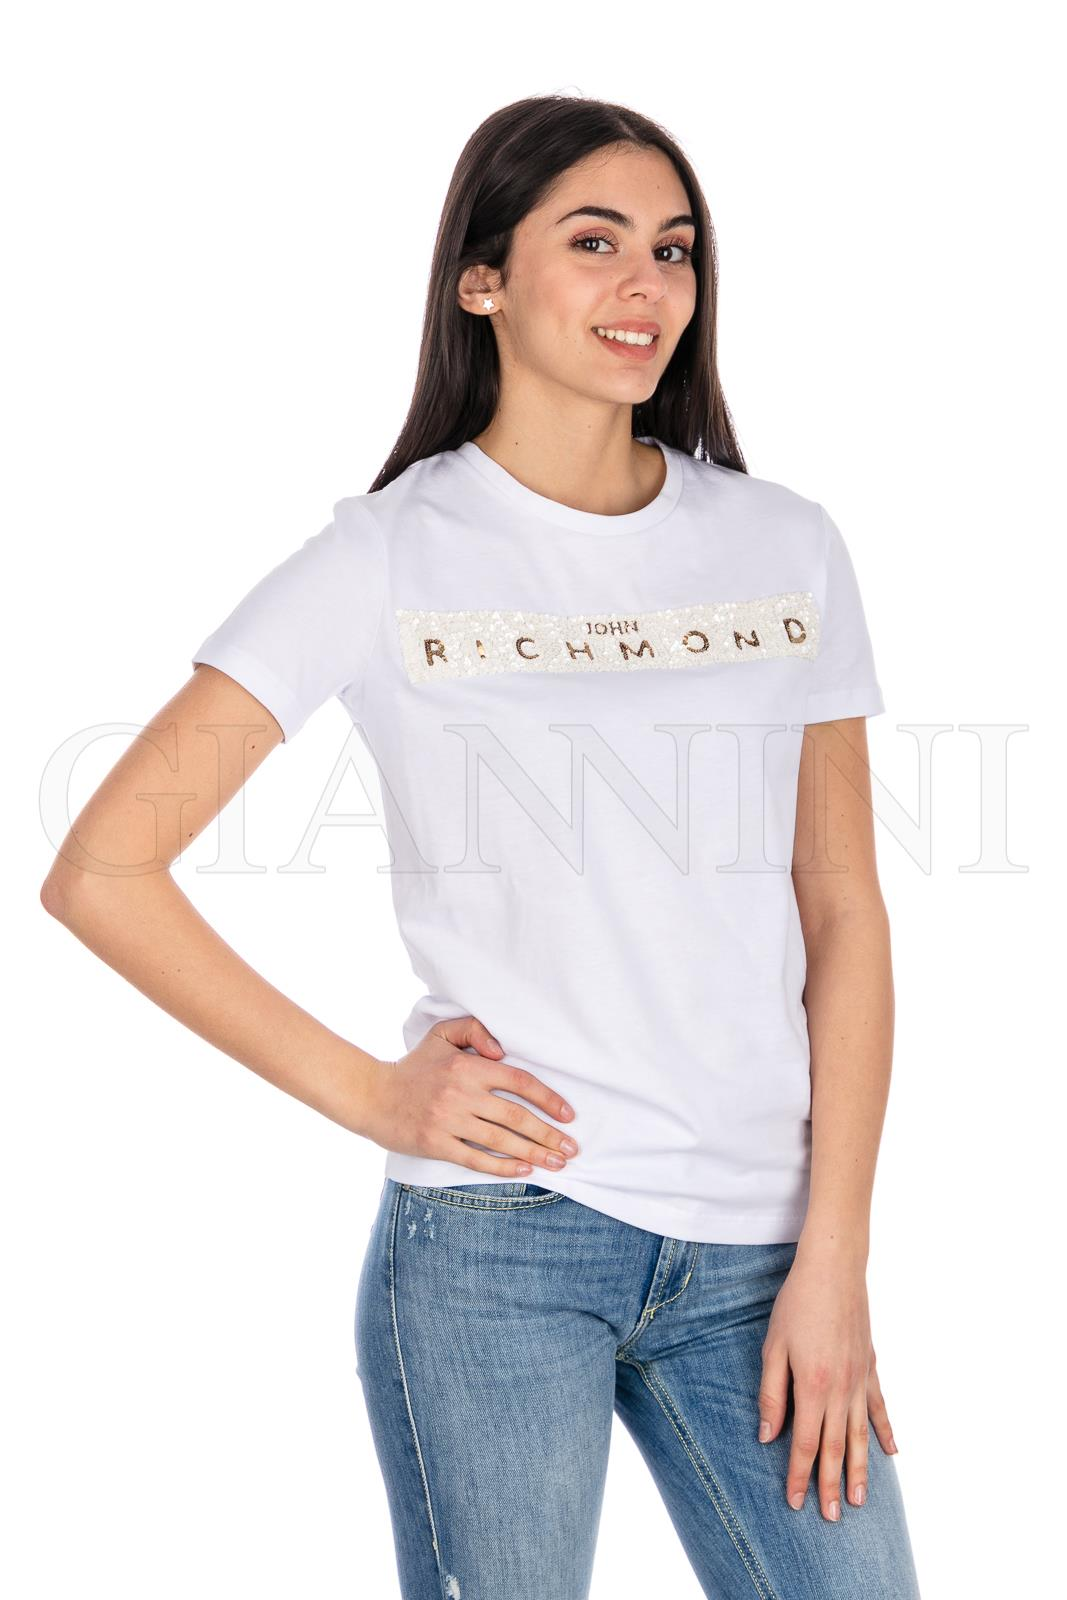 new style f2960 04ca6 RICHMOND JOHN RICHMOND JOHN